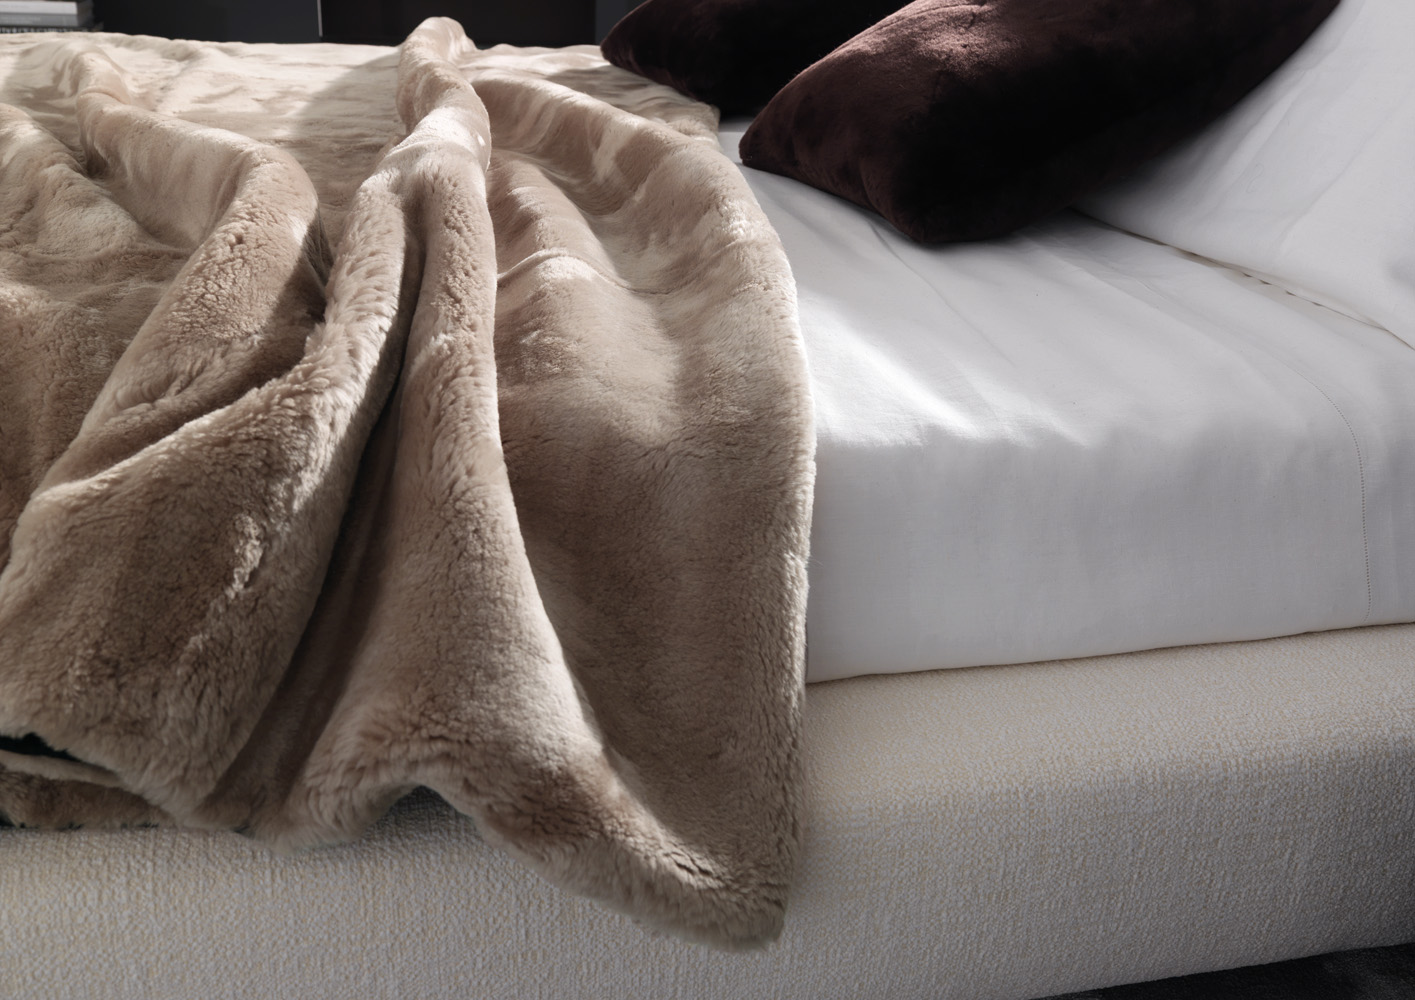 Плед из серого меха на кровати